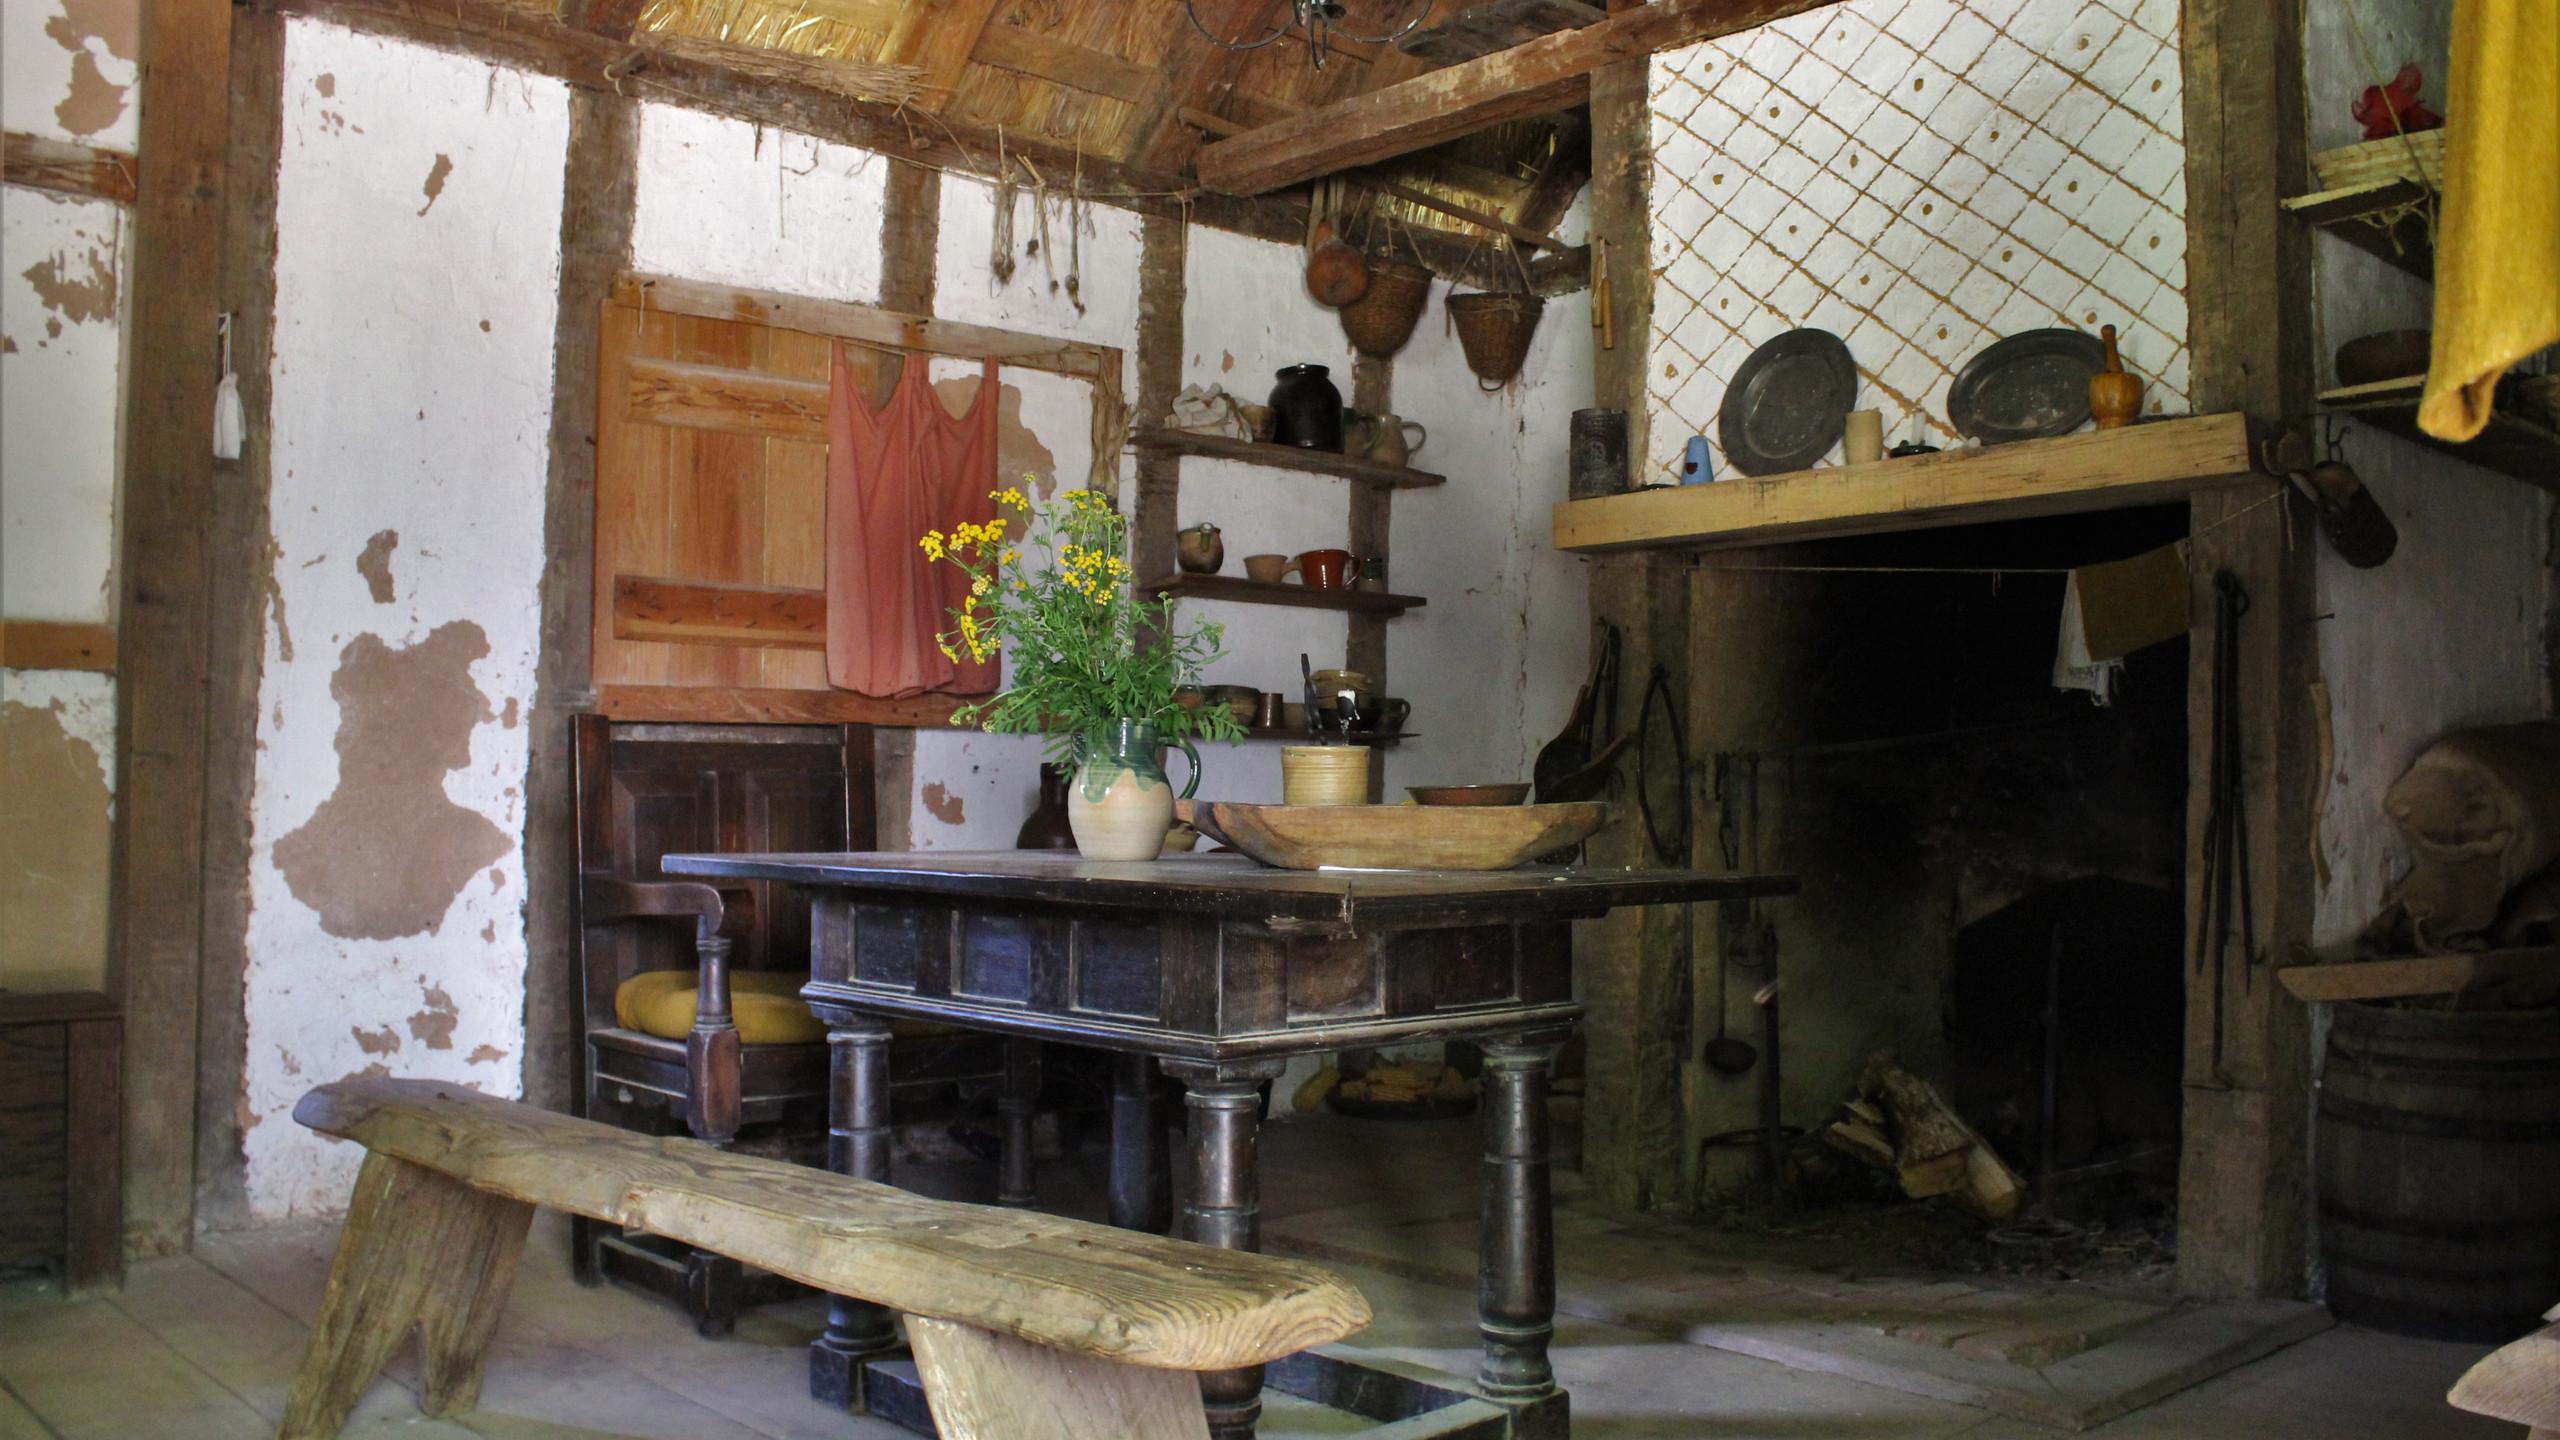 Inside of Proctor House